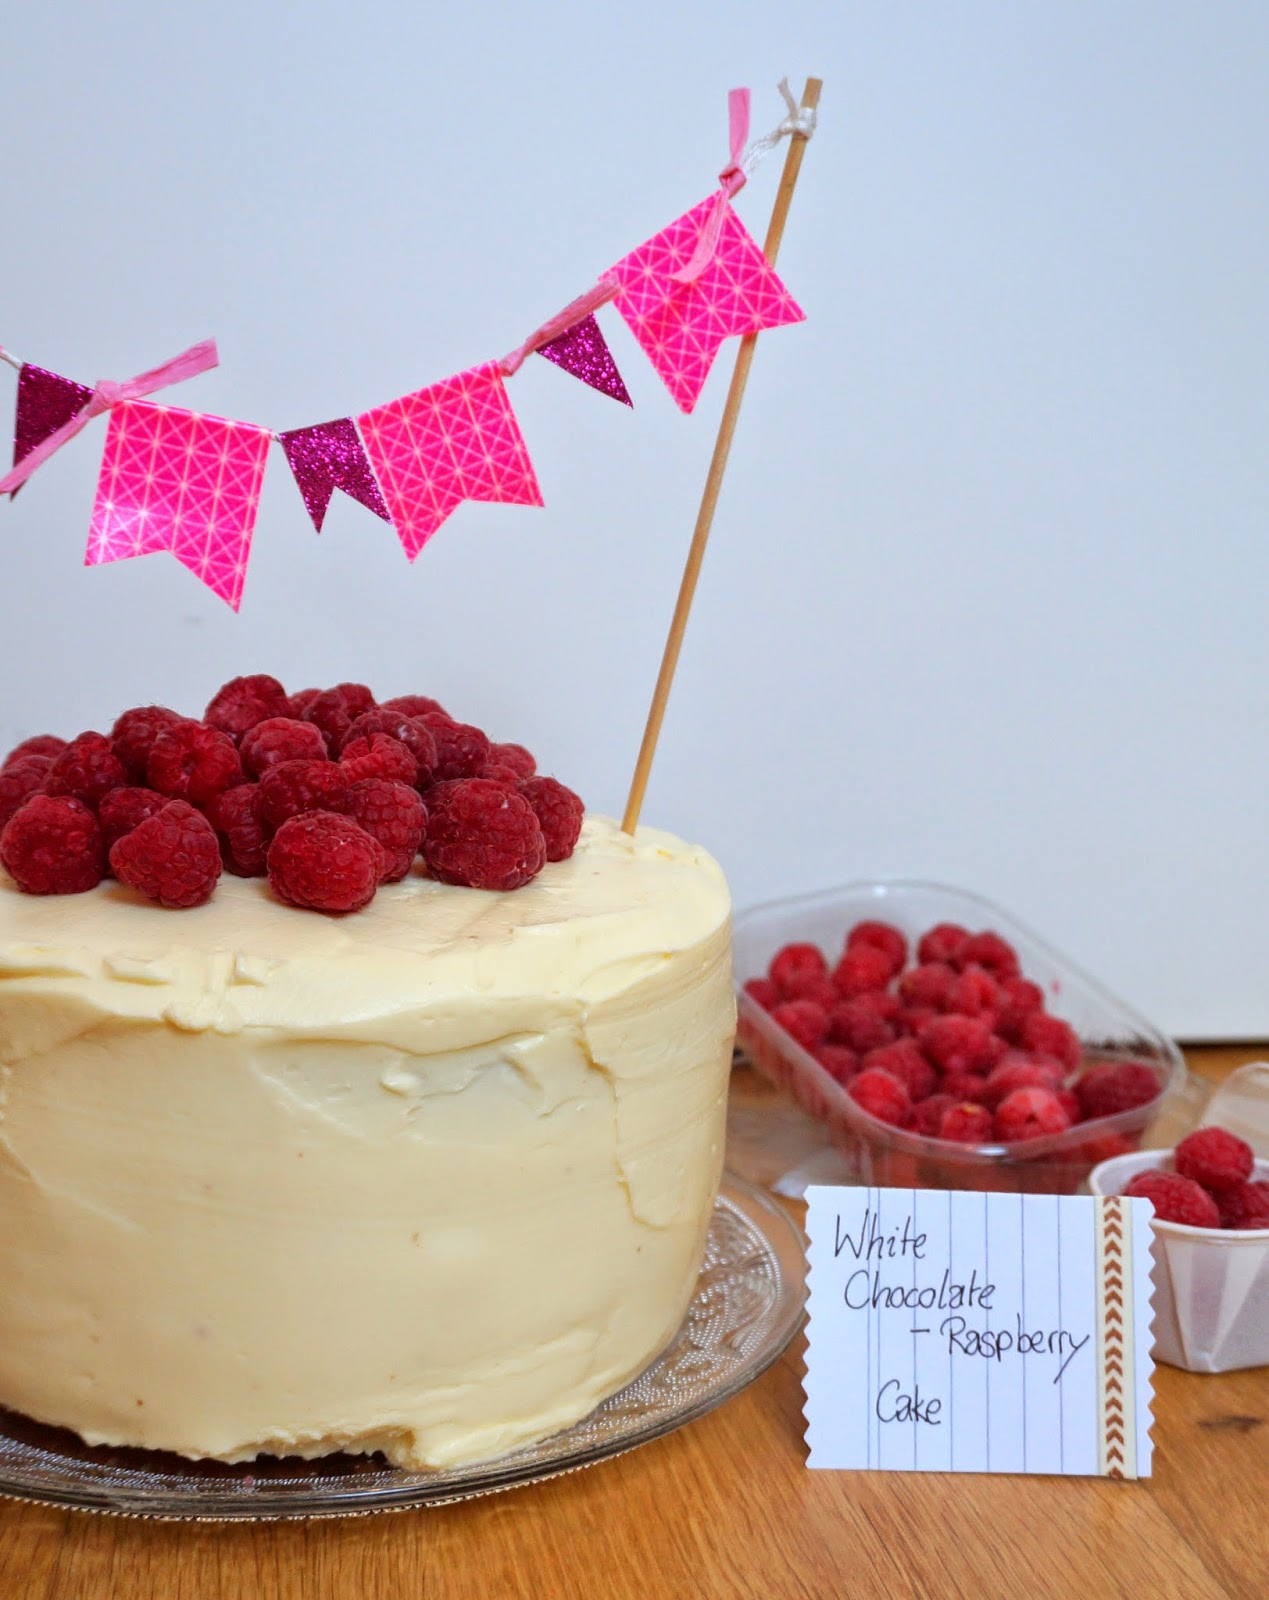 White Chocolate and Raspberry, Raspberry Cake, Himbeertorte, weiße Schokolade und Himbeeren